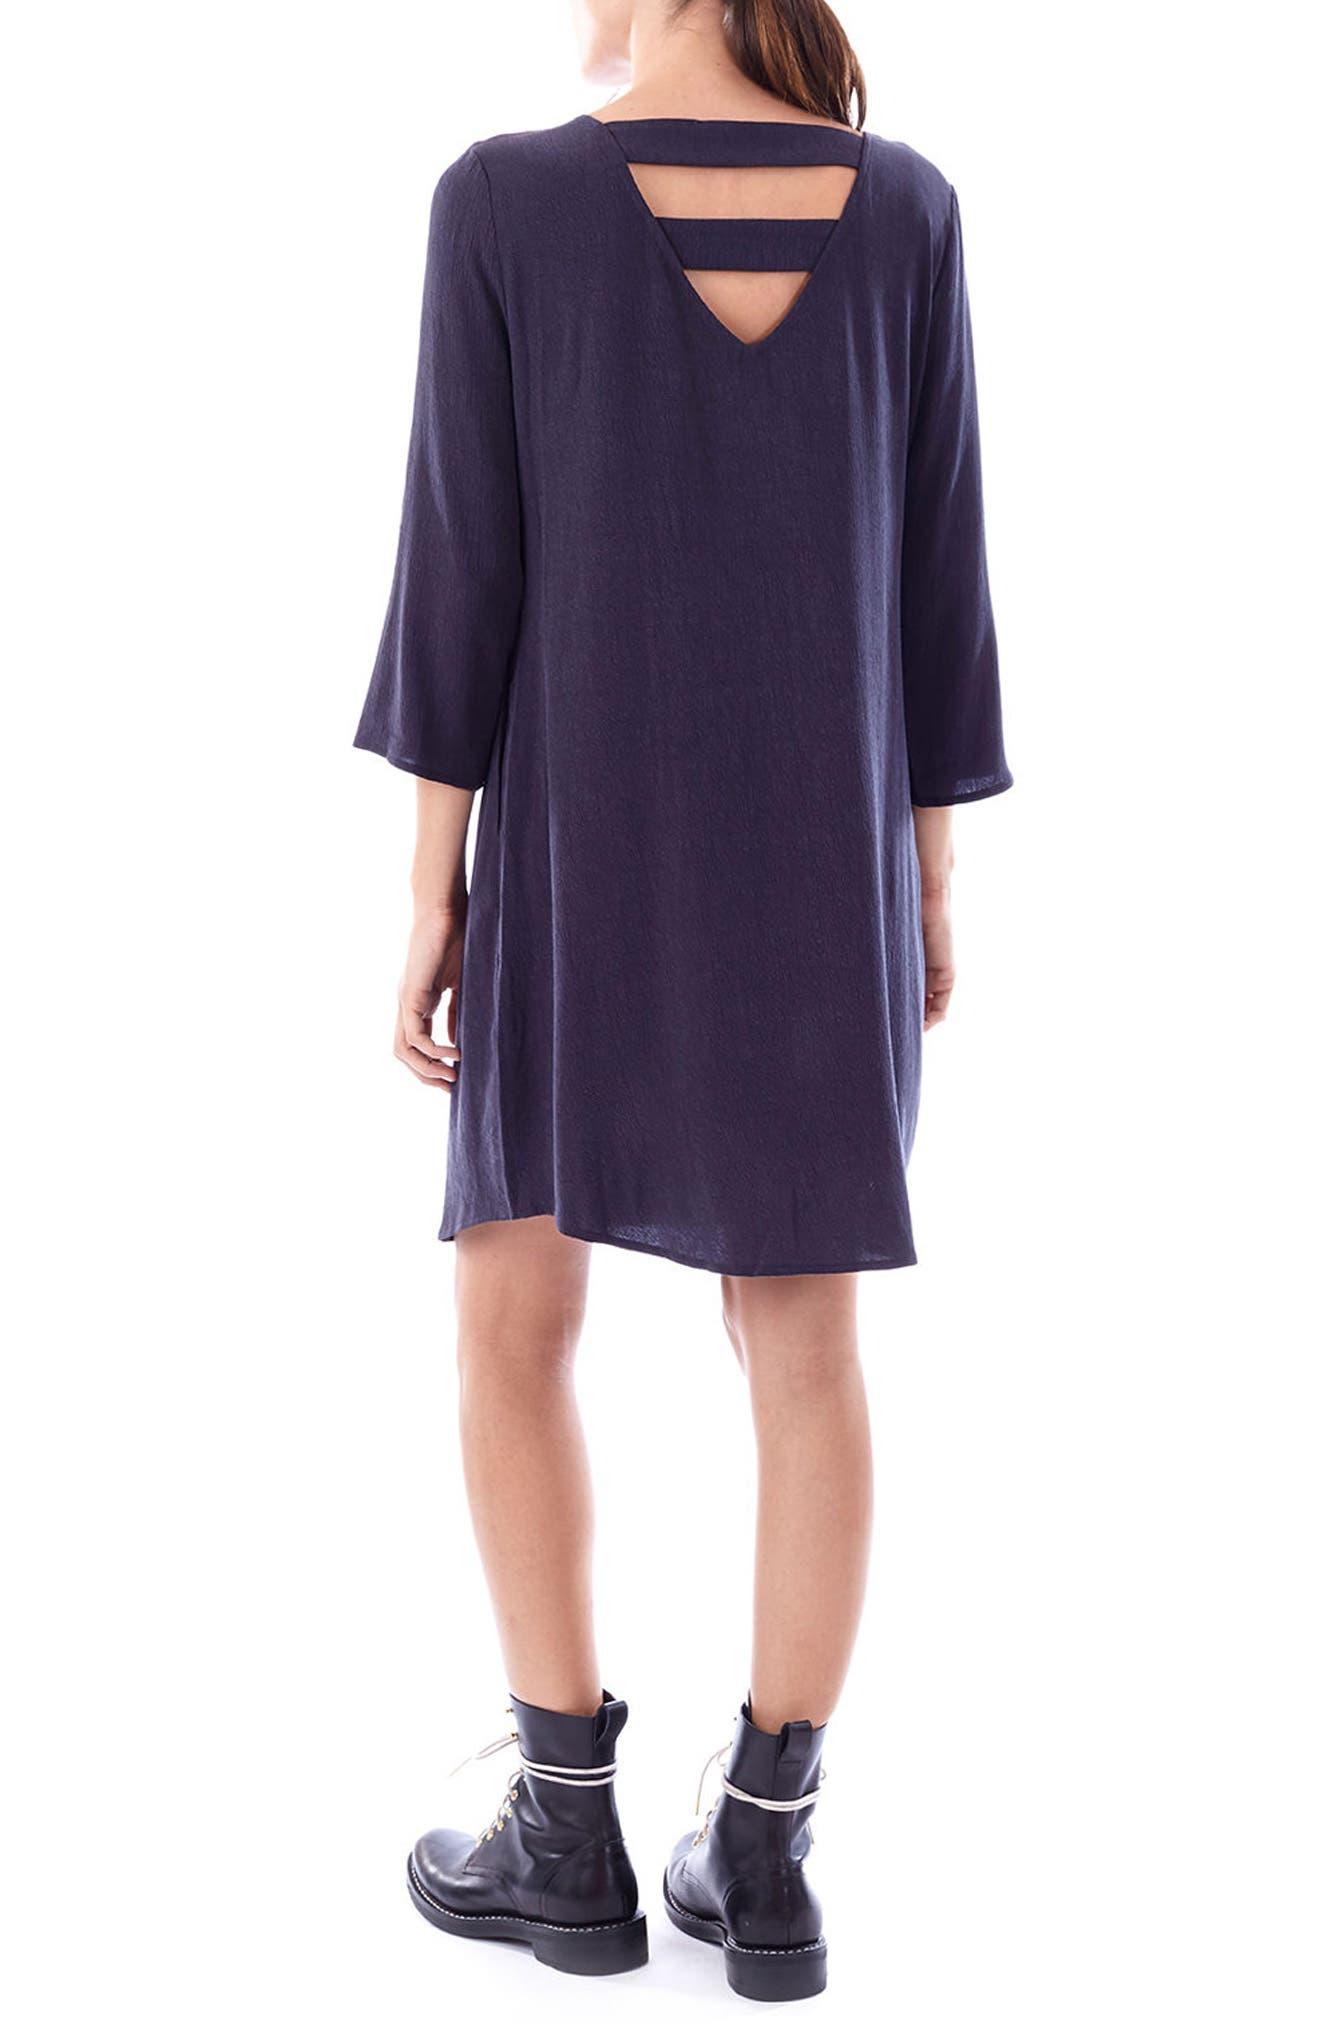 Layla Maternity/Nursing Dress,                             Alternate thumbnail 2, color,                             CHARCOAL